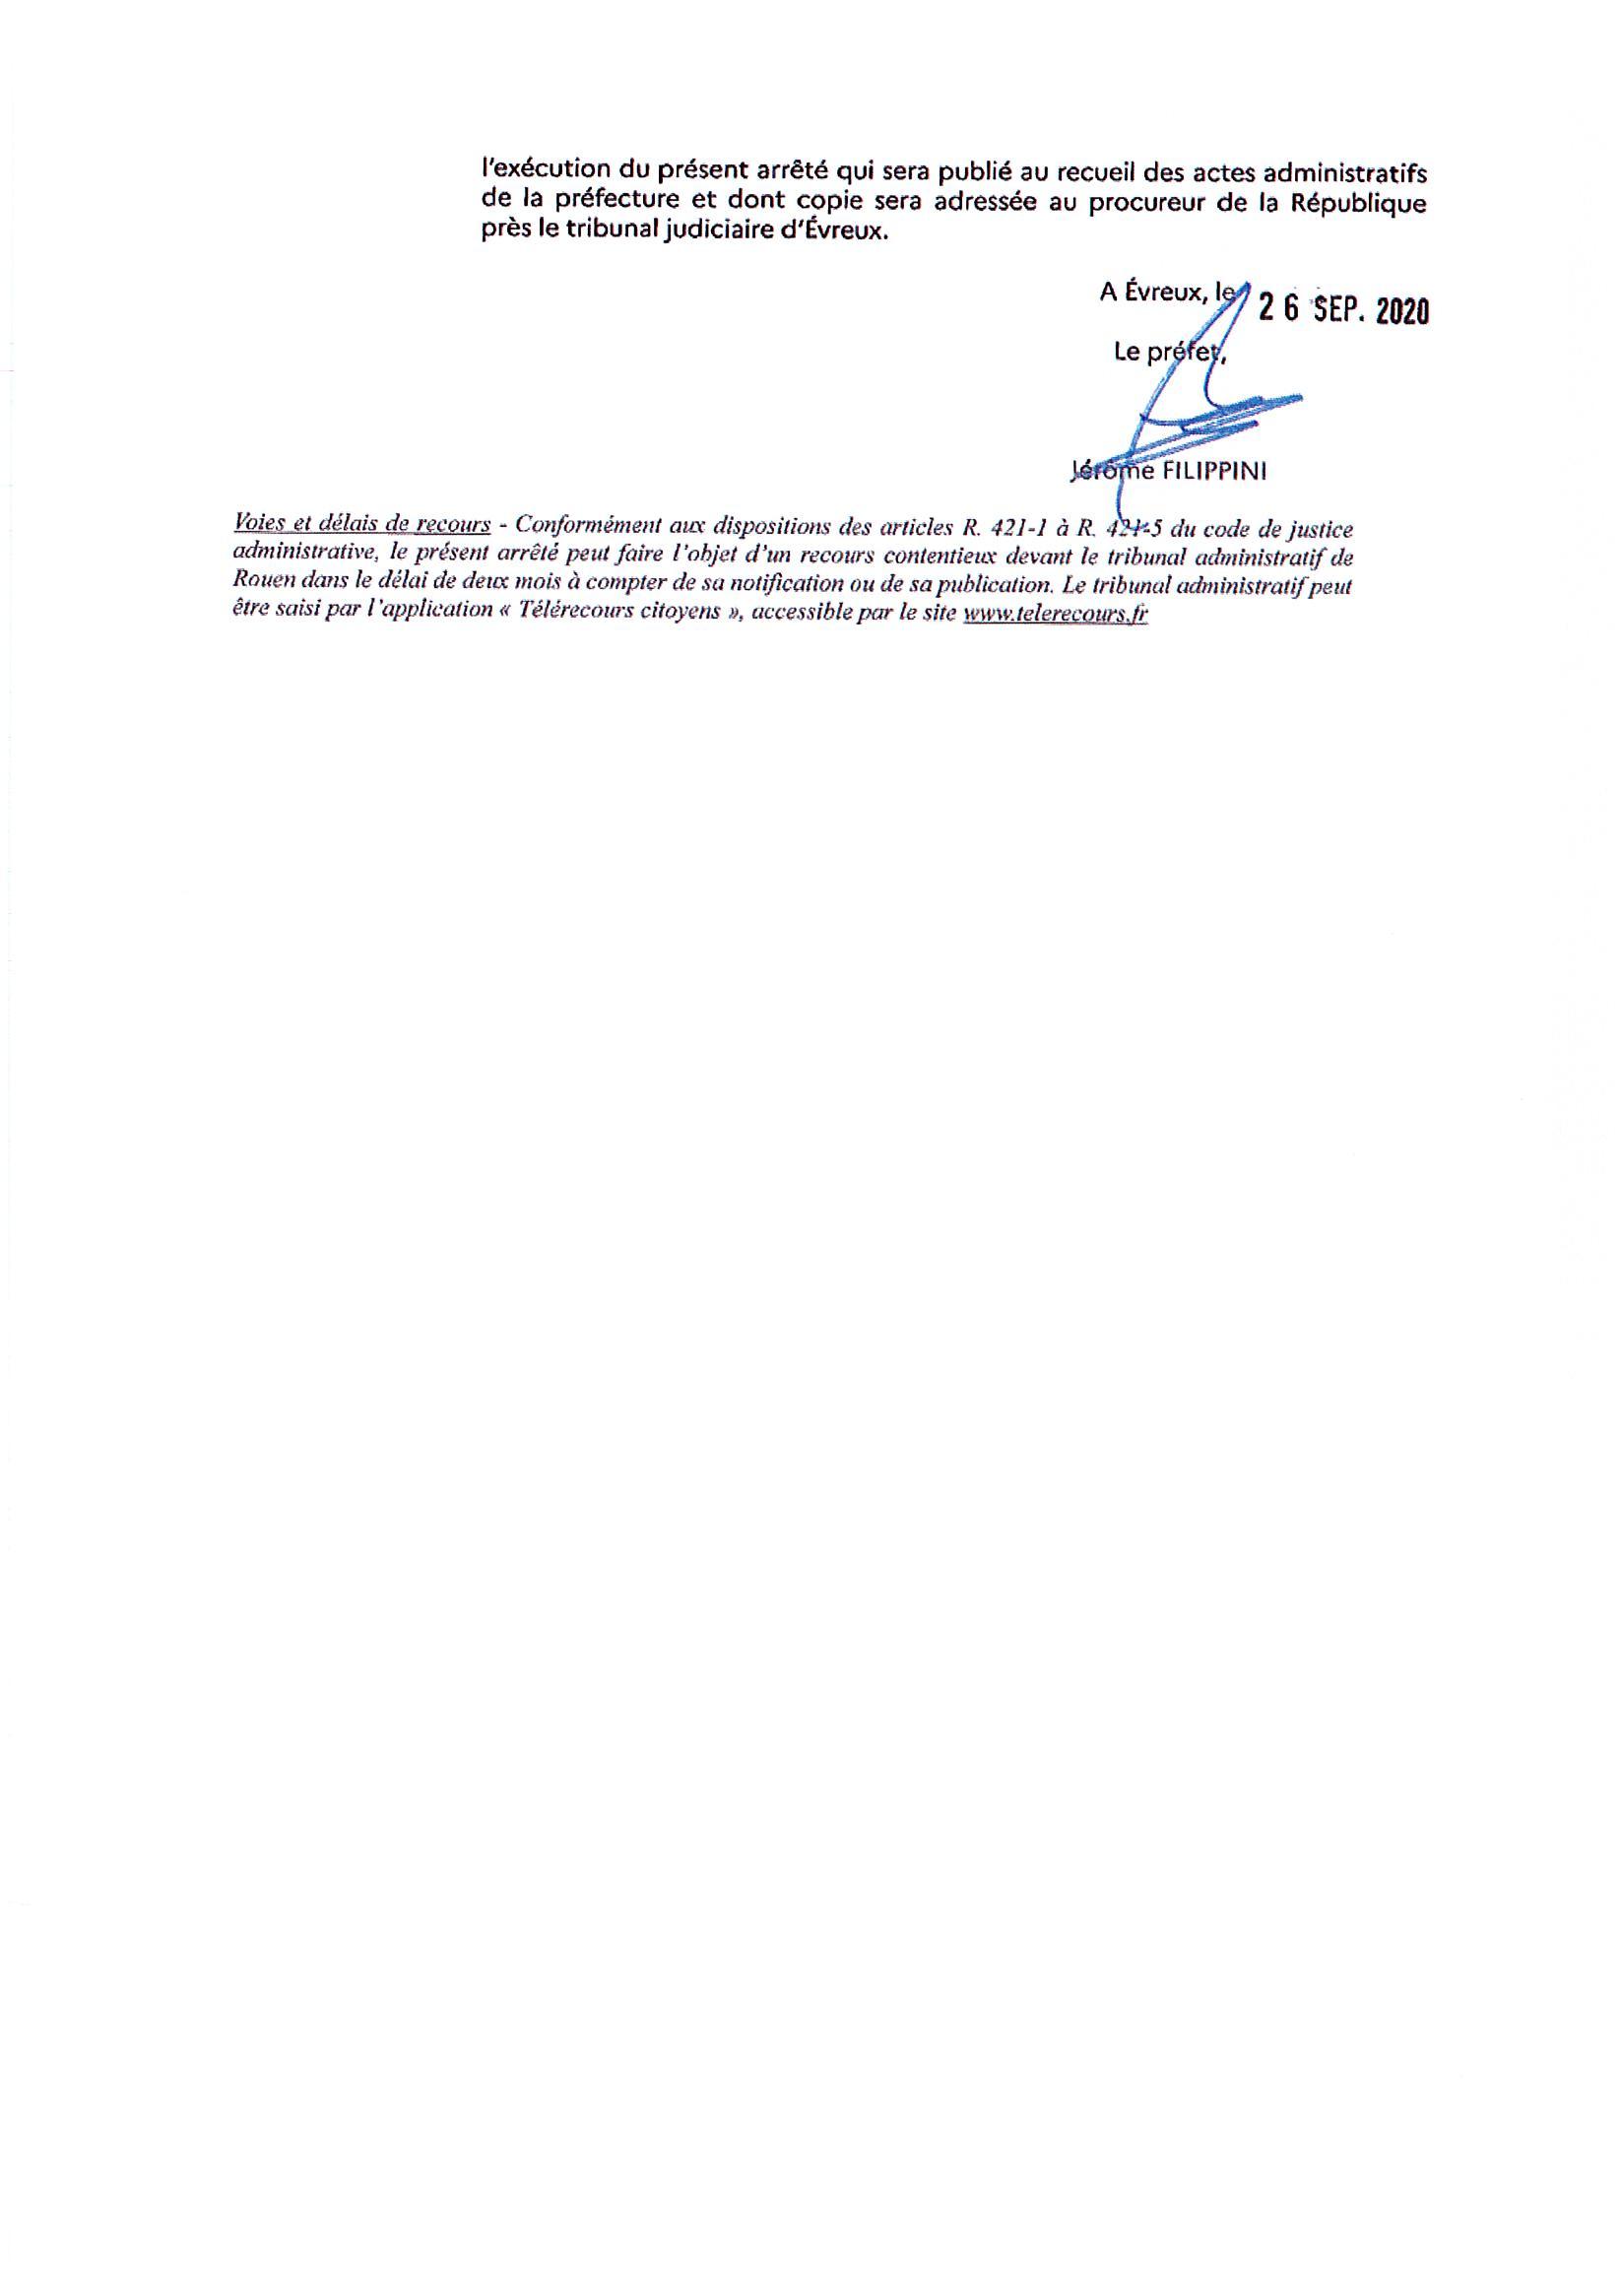 DOC280920-0003